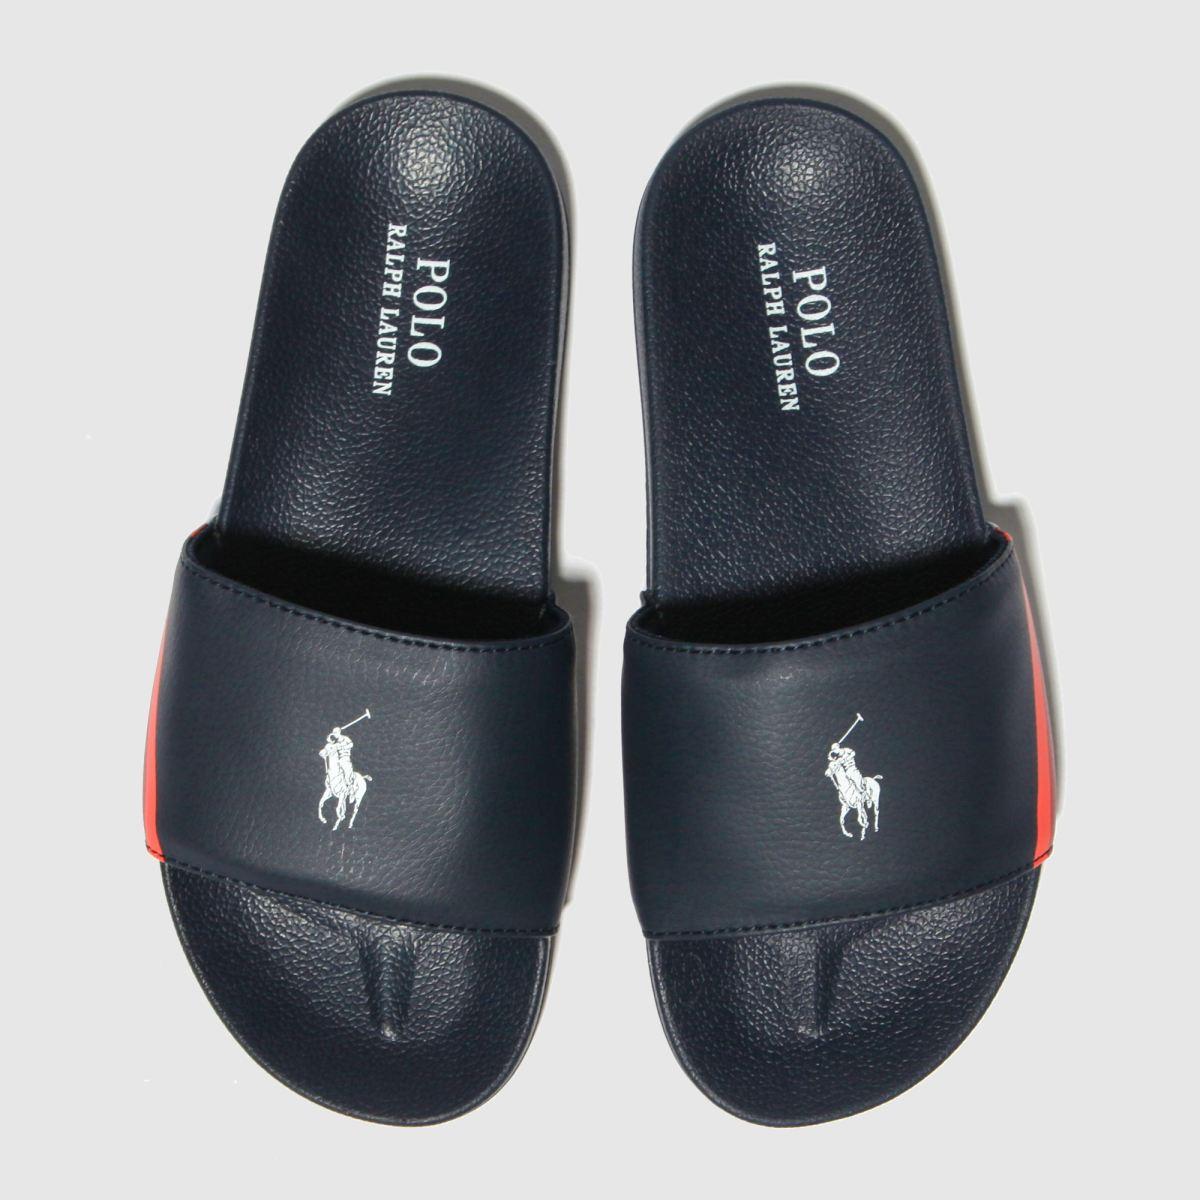 Polo Ralph Lauren Navy & Red Fletcher Slide Sandals Youth